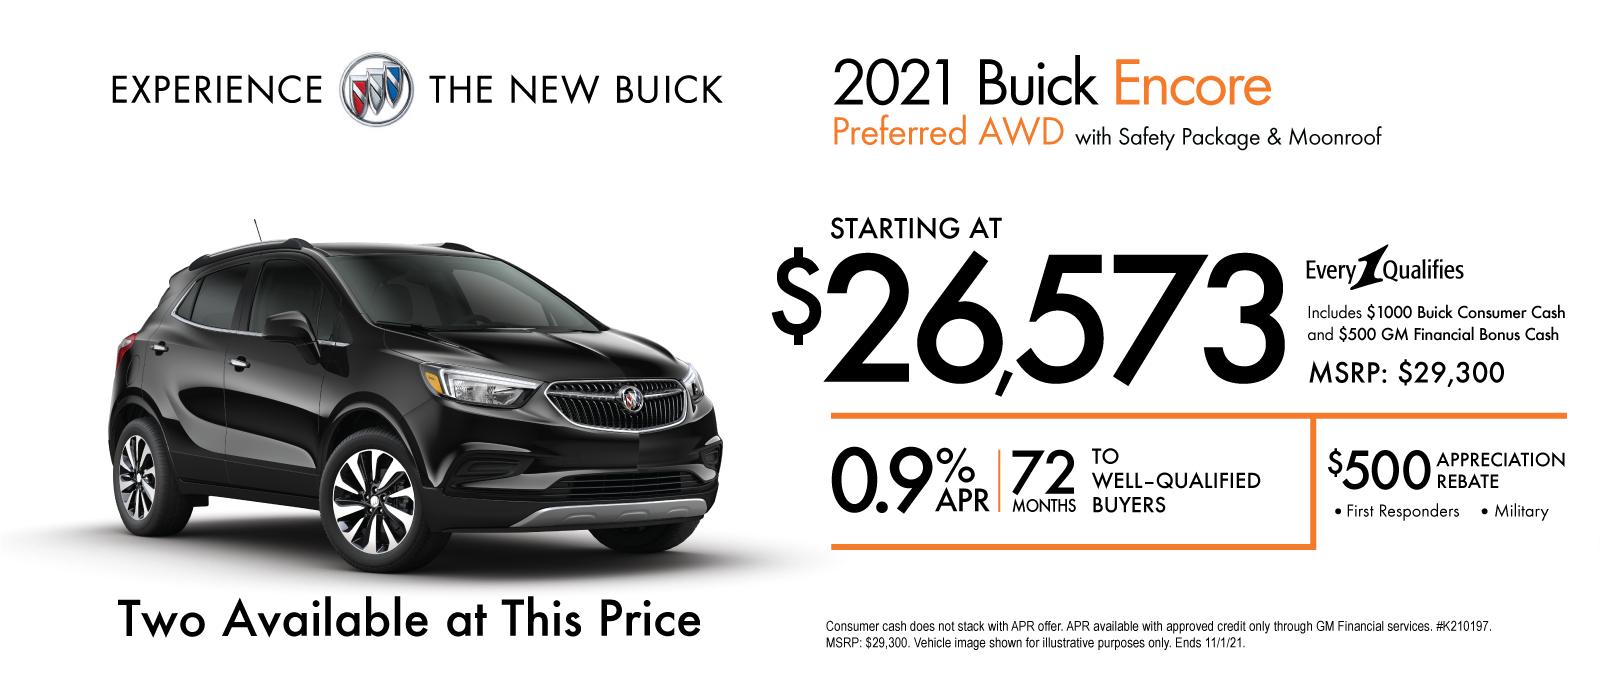 October-2021-Buick-CS-Slides_2021-Buick-Encore-BUY